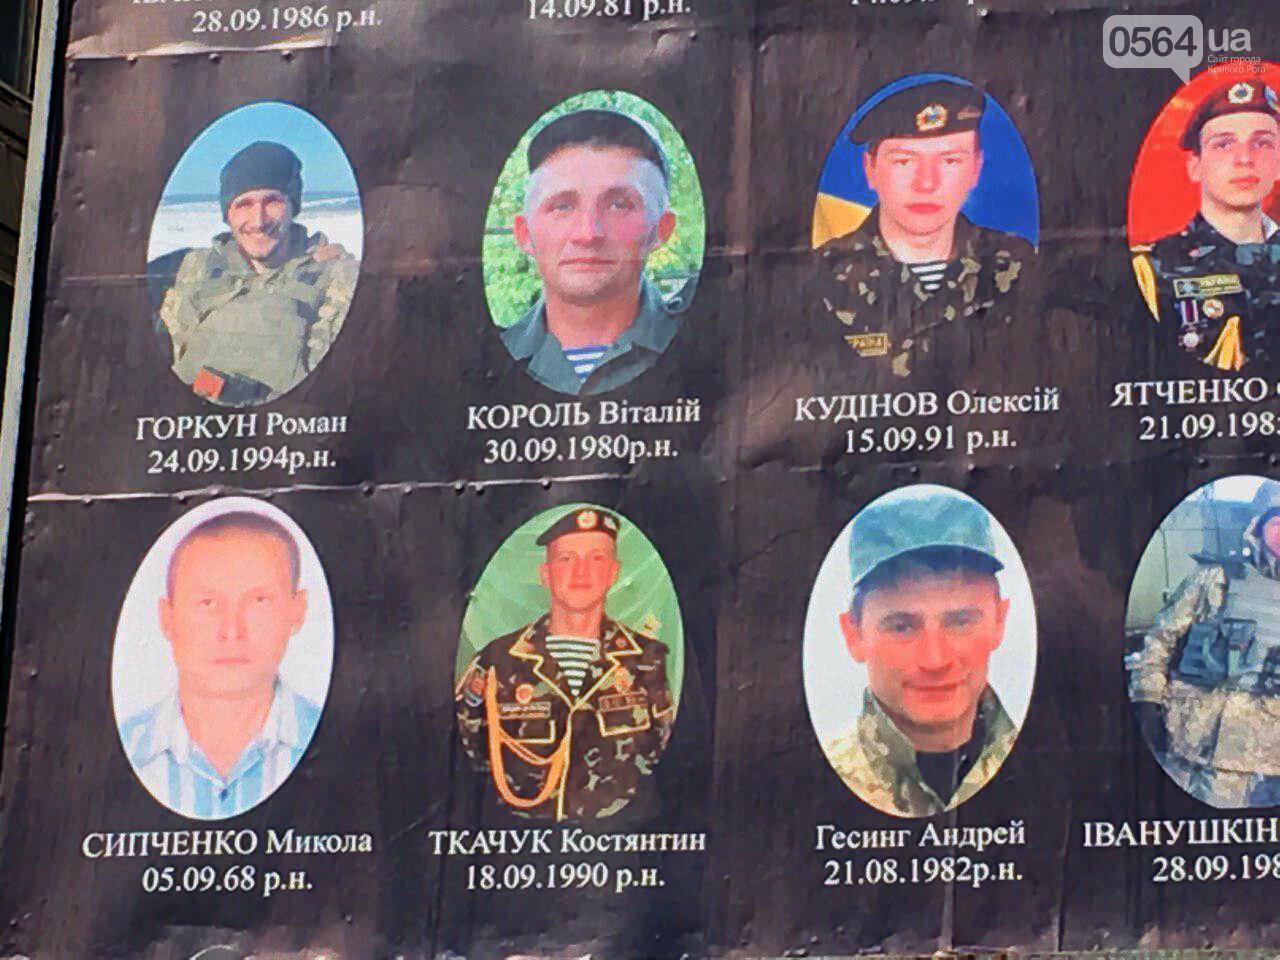 """Навіки шана"": в центре Кривого Рога разместили борд с фотографиями 11 Героев, погибших в АТО, - ФОТО , фото-7"